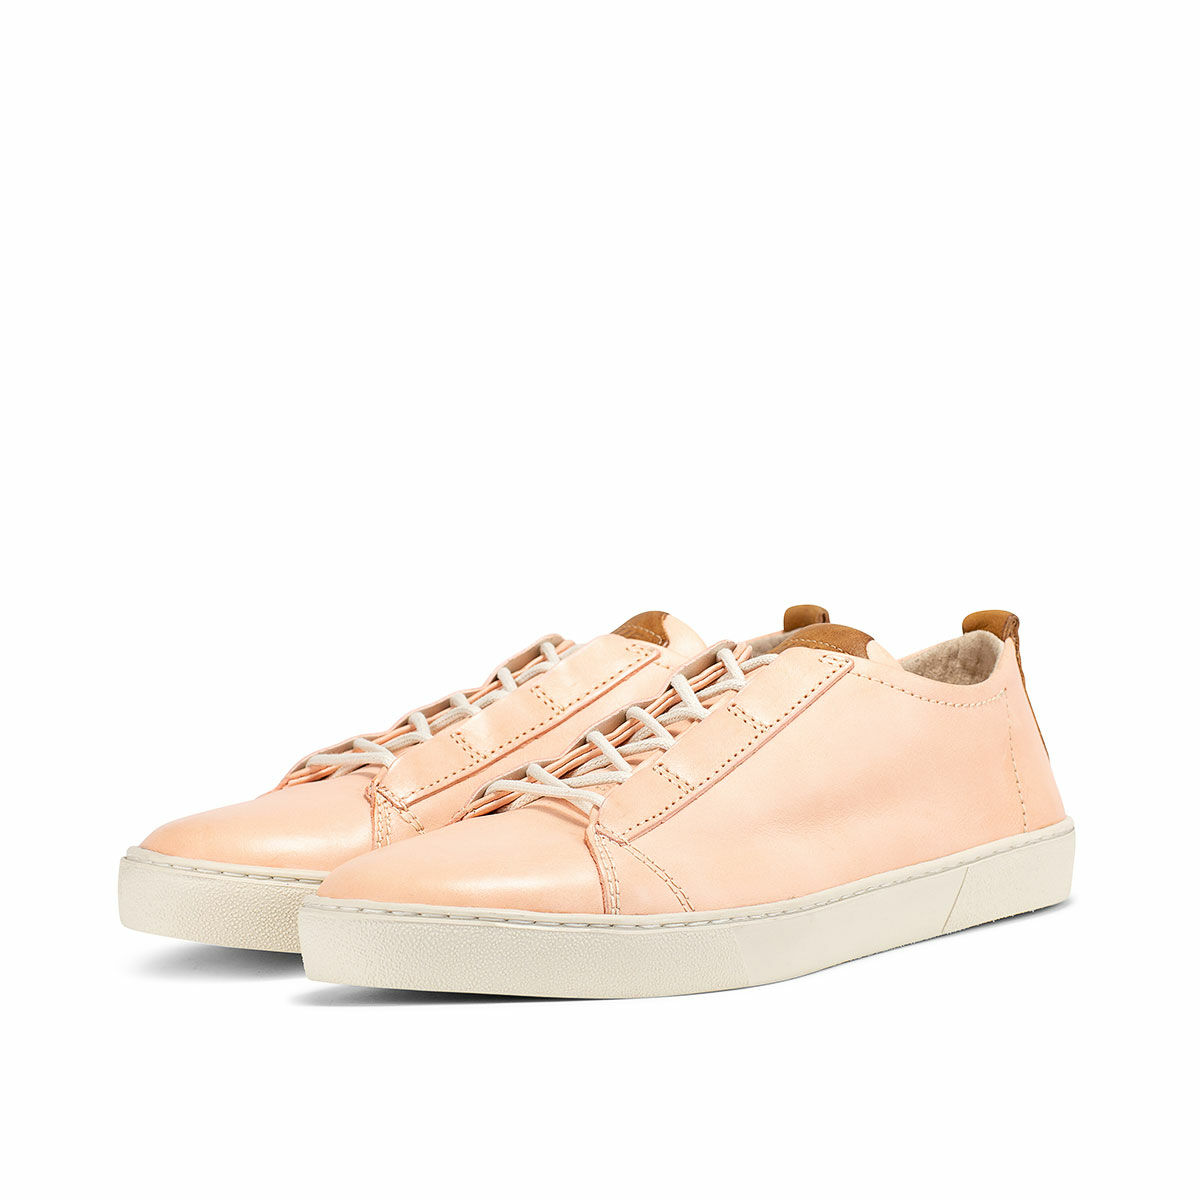 CINQUE women Sneaker CIASMARA CI-22096-10-42-211-36 taupe